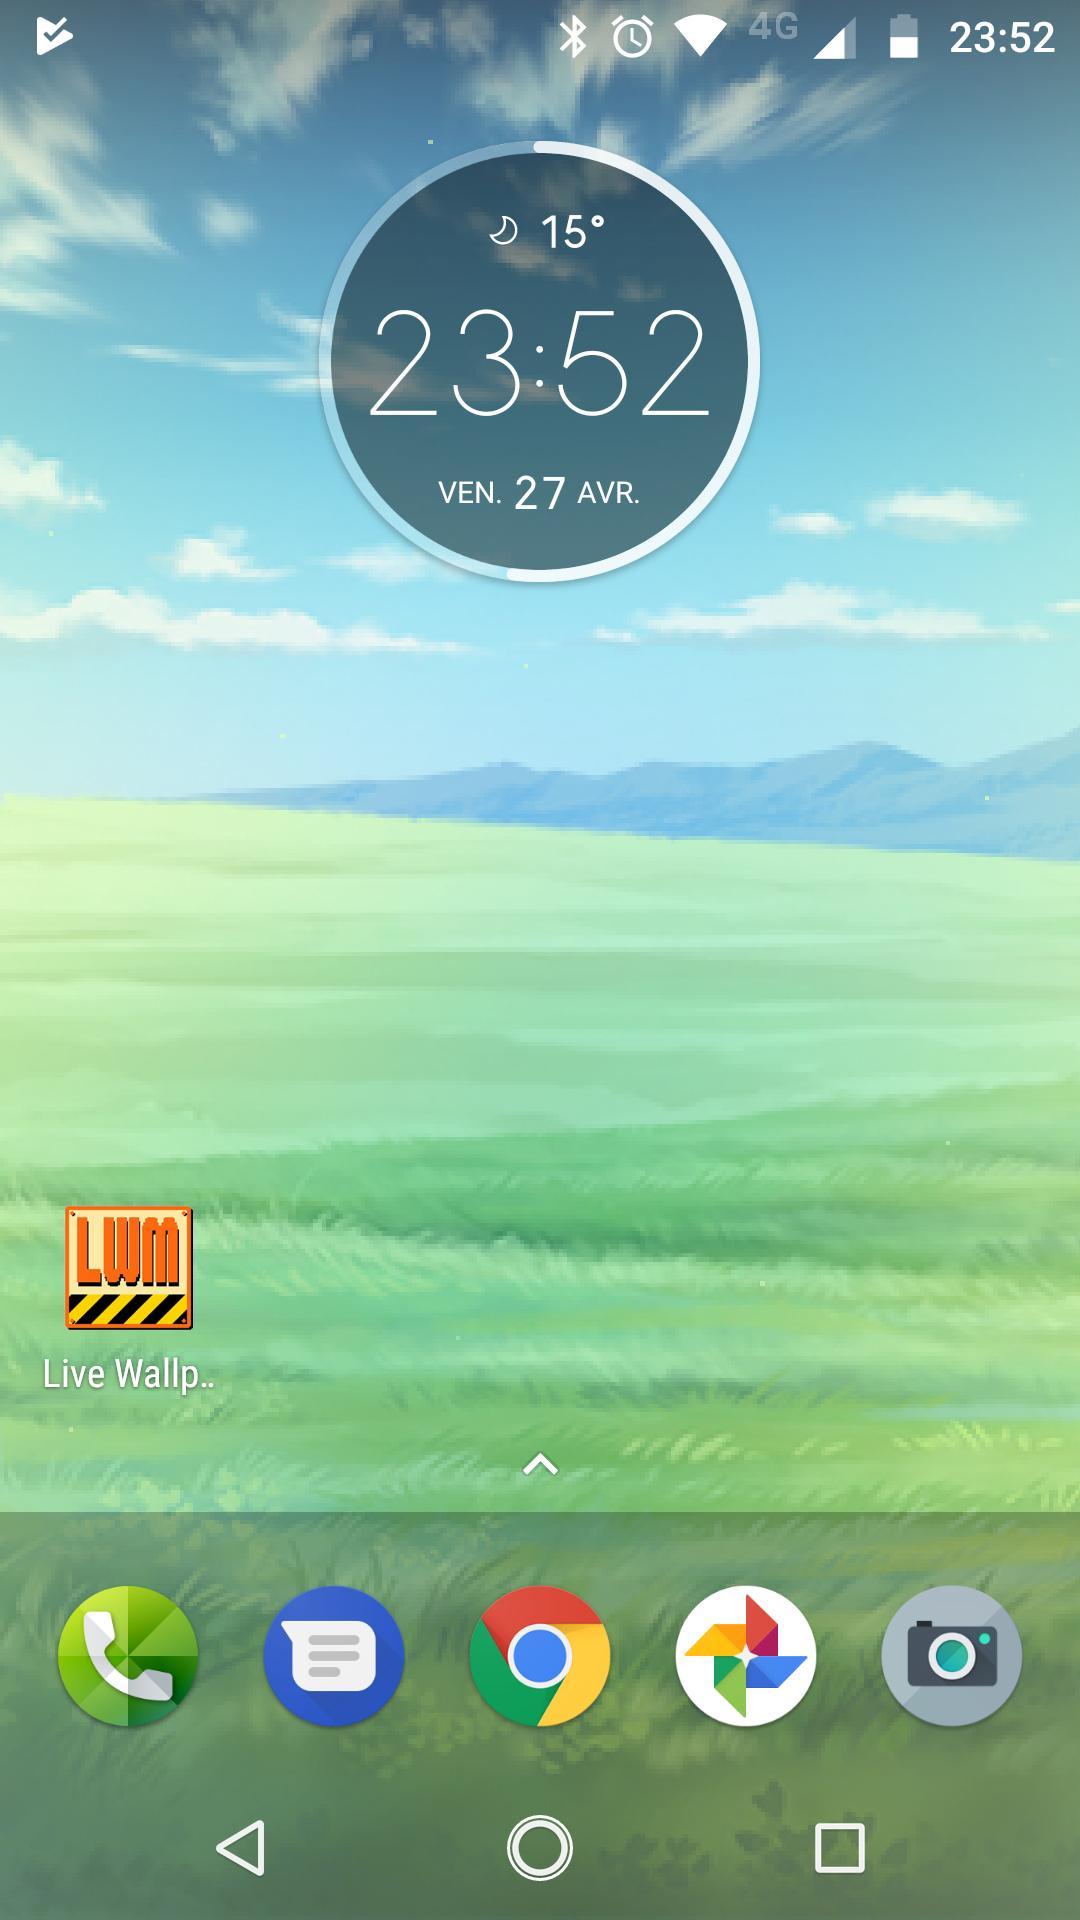 Live Wallpaper Maker for Android - APK Download